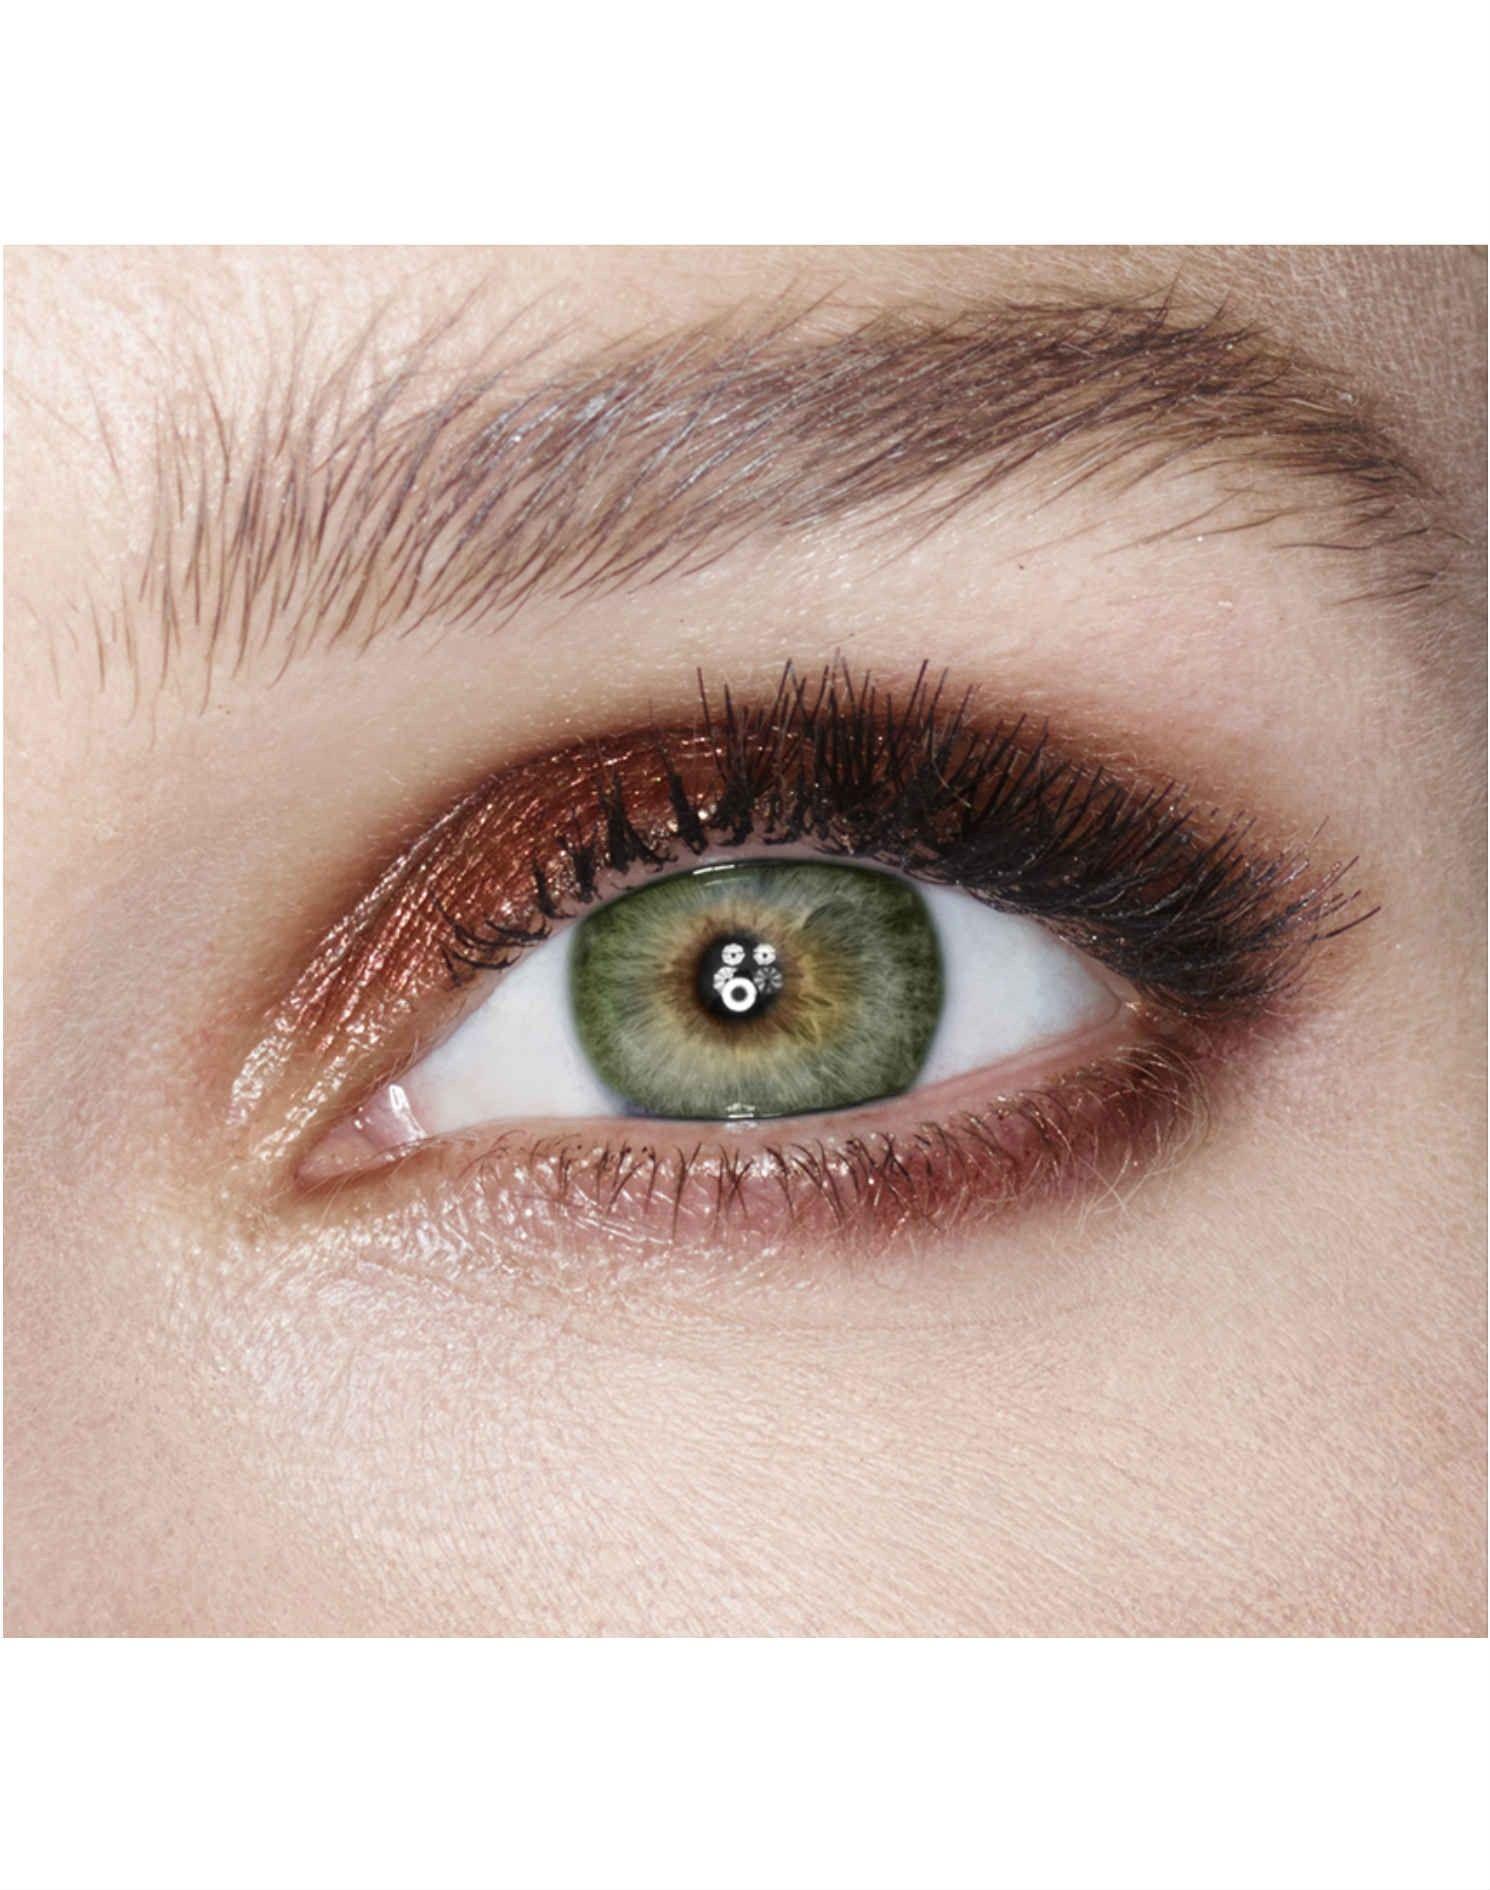 2d4643371aceb Charlotte Tilbury Colour Chameleon Bronzed Garnet Eyeshadow Pencil Makeup  Essentials